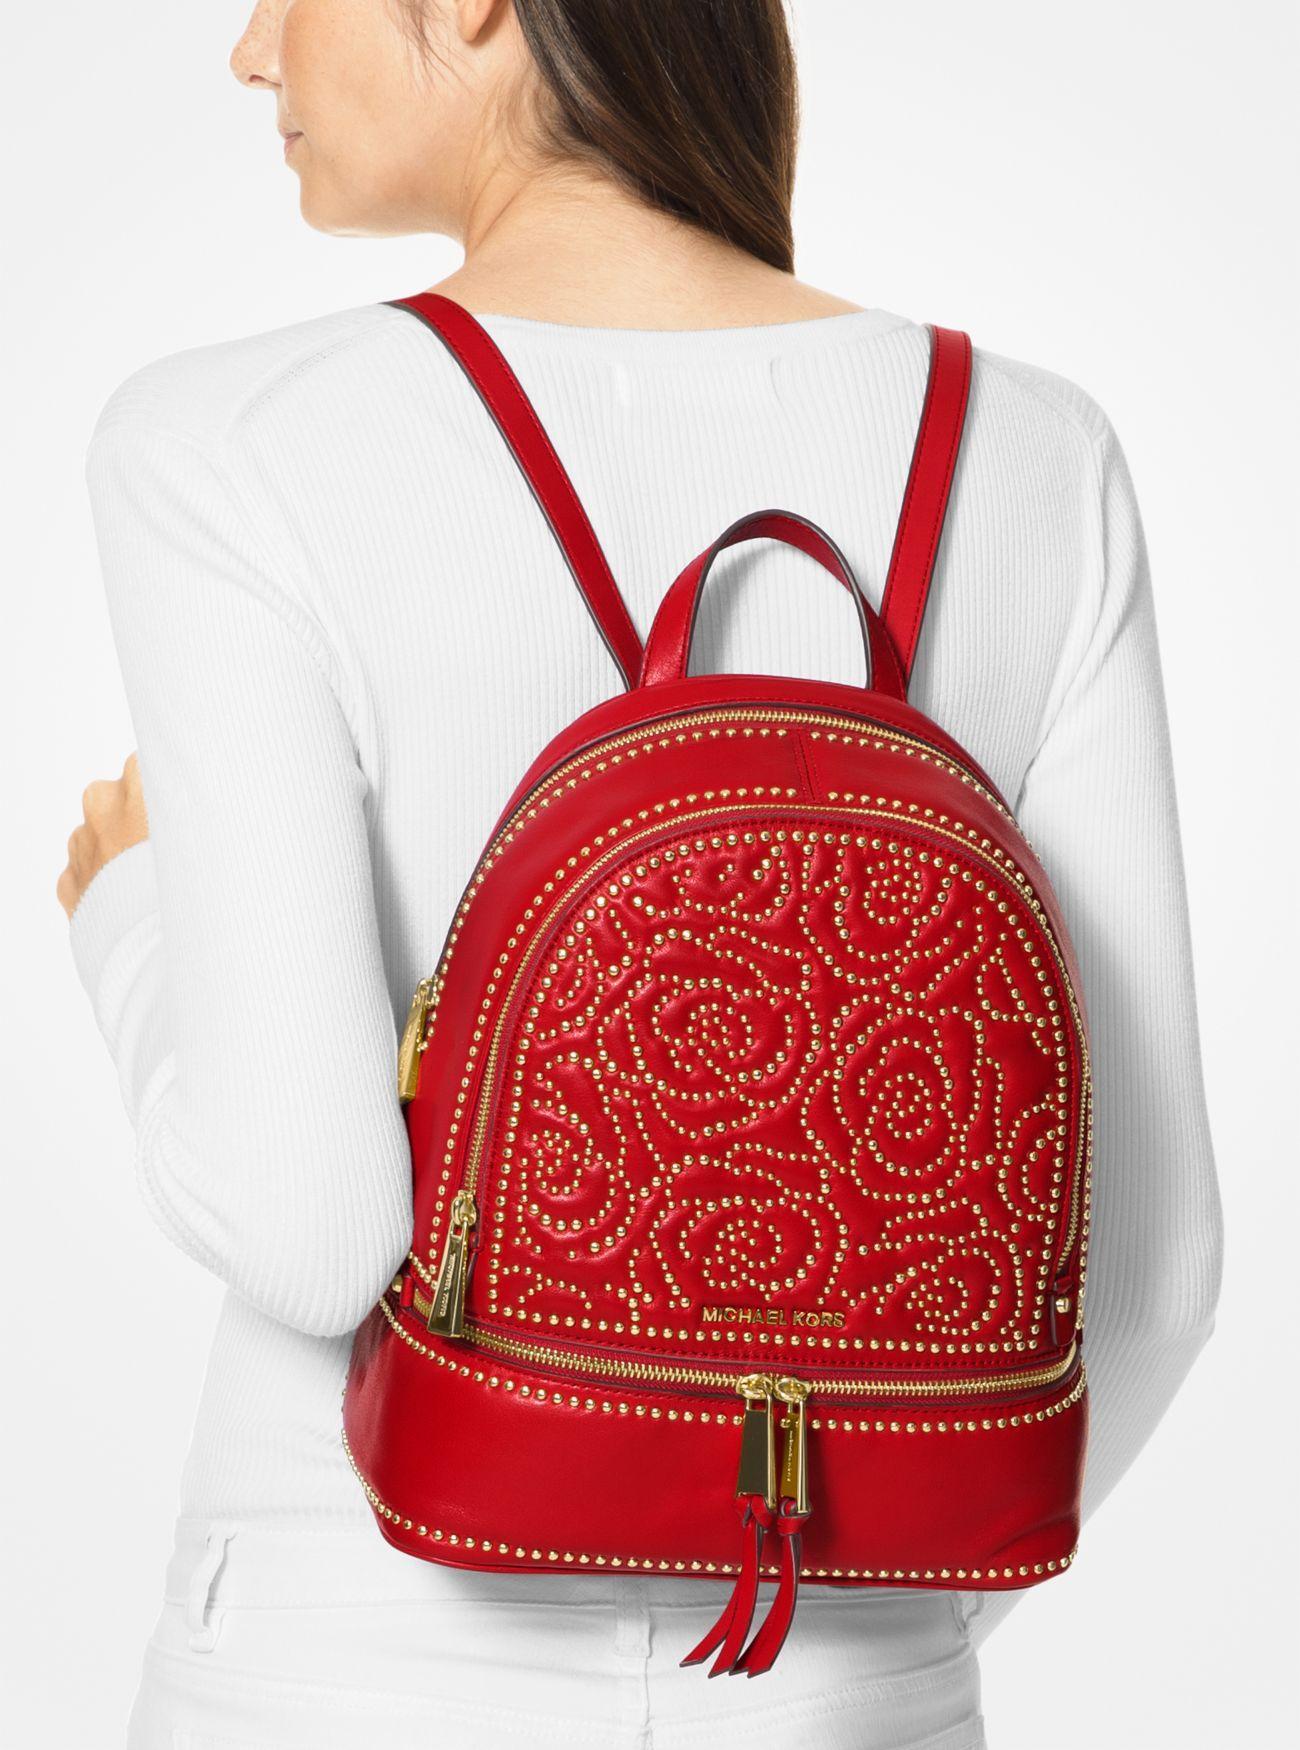 2b2badadbb22 Michael Kors Rhea Medium Rose Studded Leather Backpack in Red - Save ...